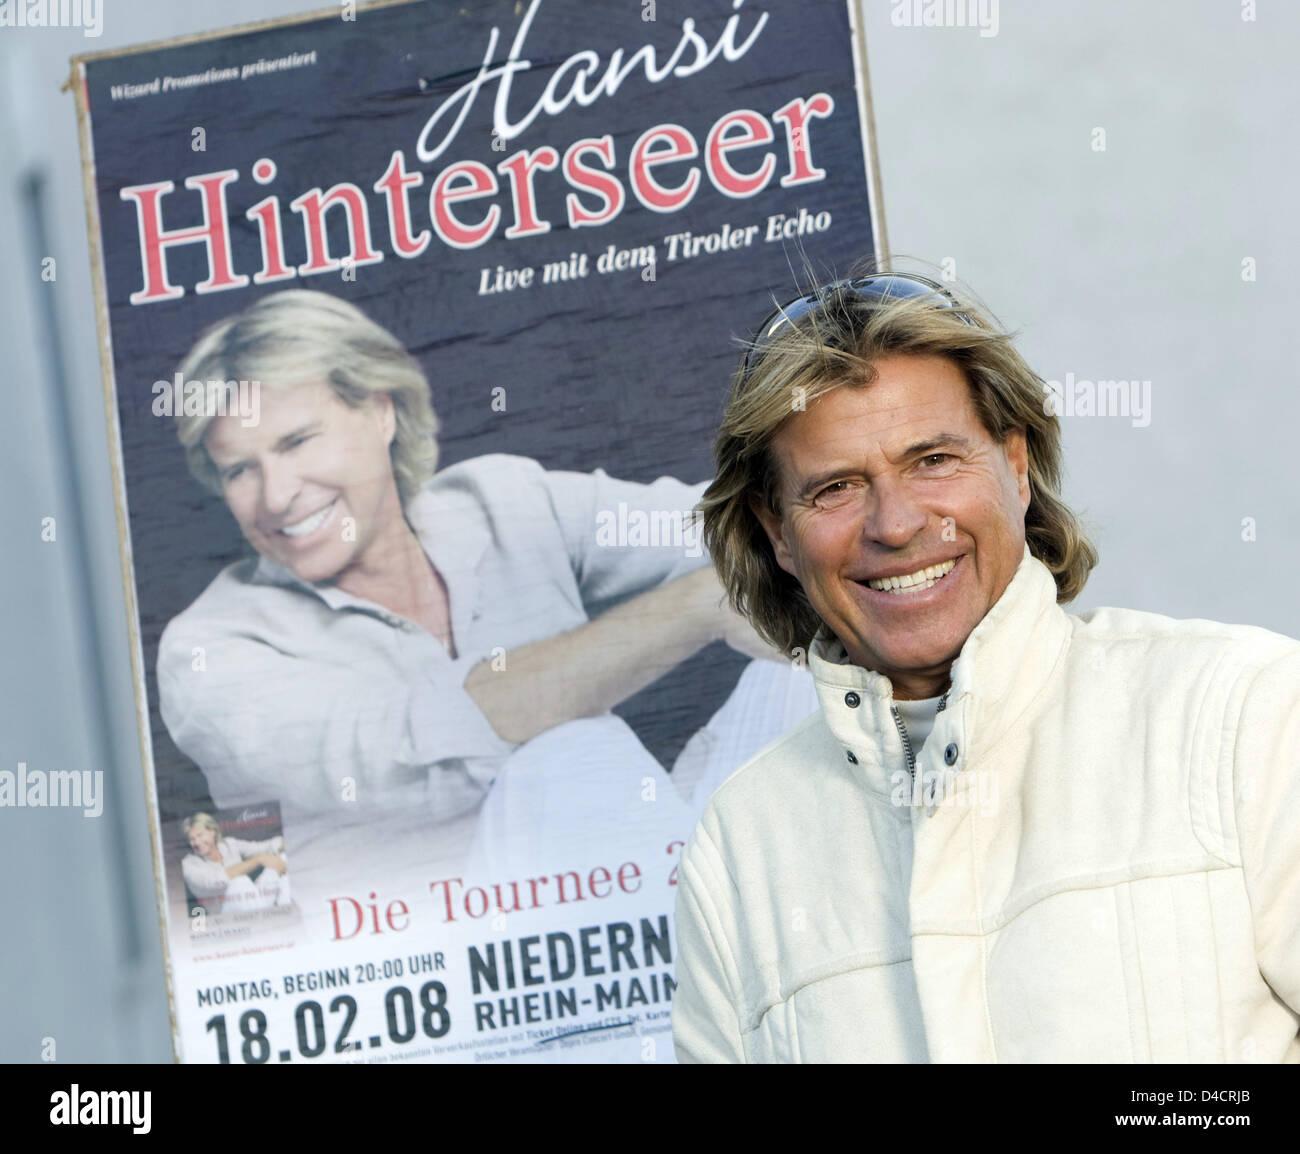 hansi hinterseer schwul